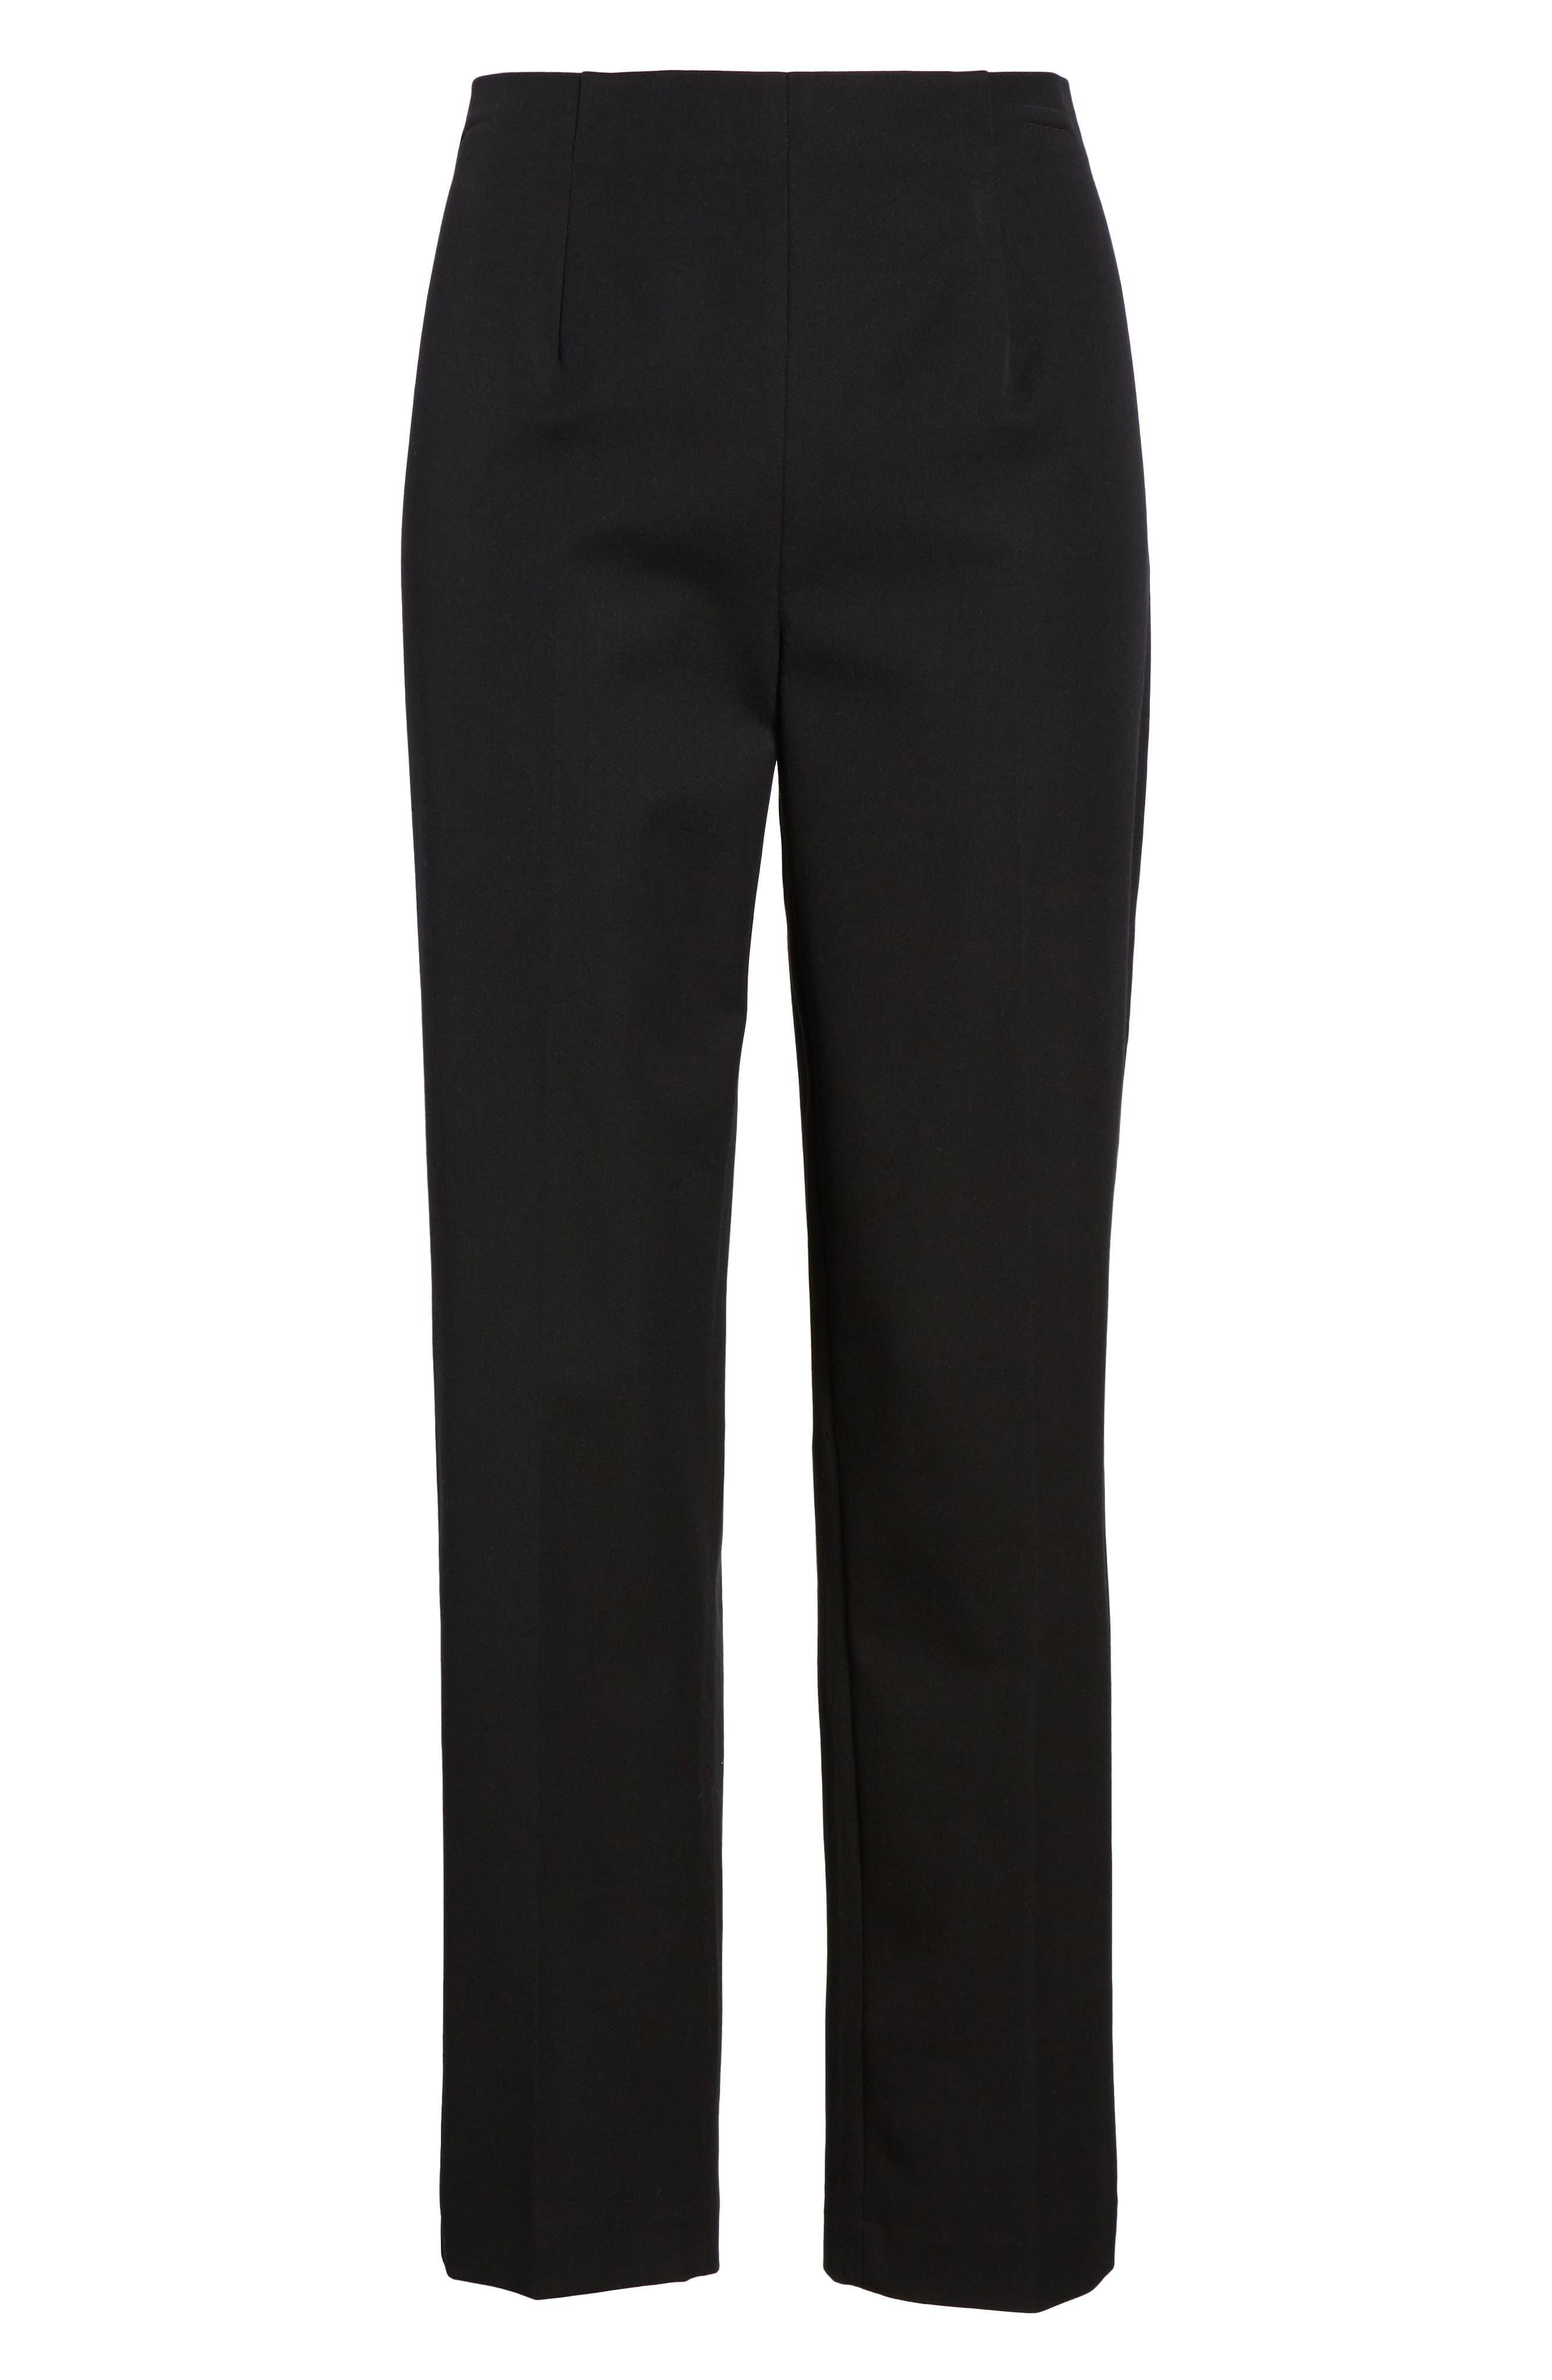 Woven Slim Ankle Pants,                             Alternate thumbnail 7, color,                             BLACK